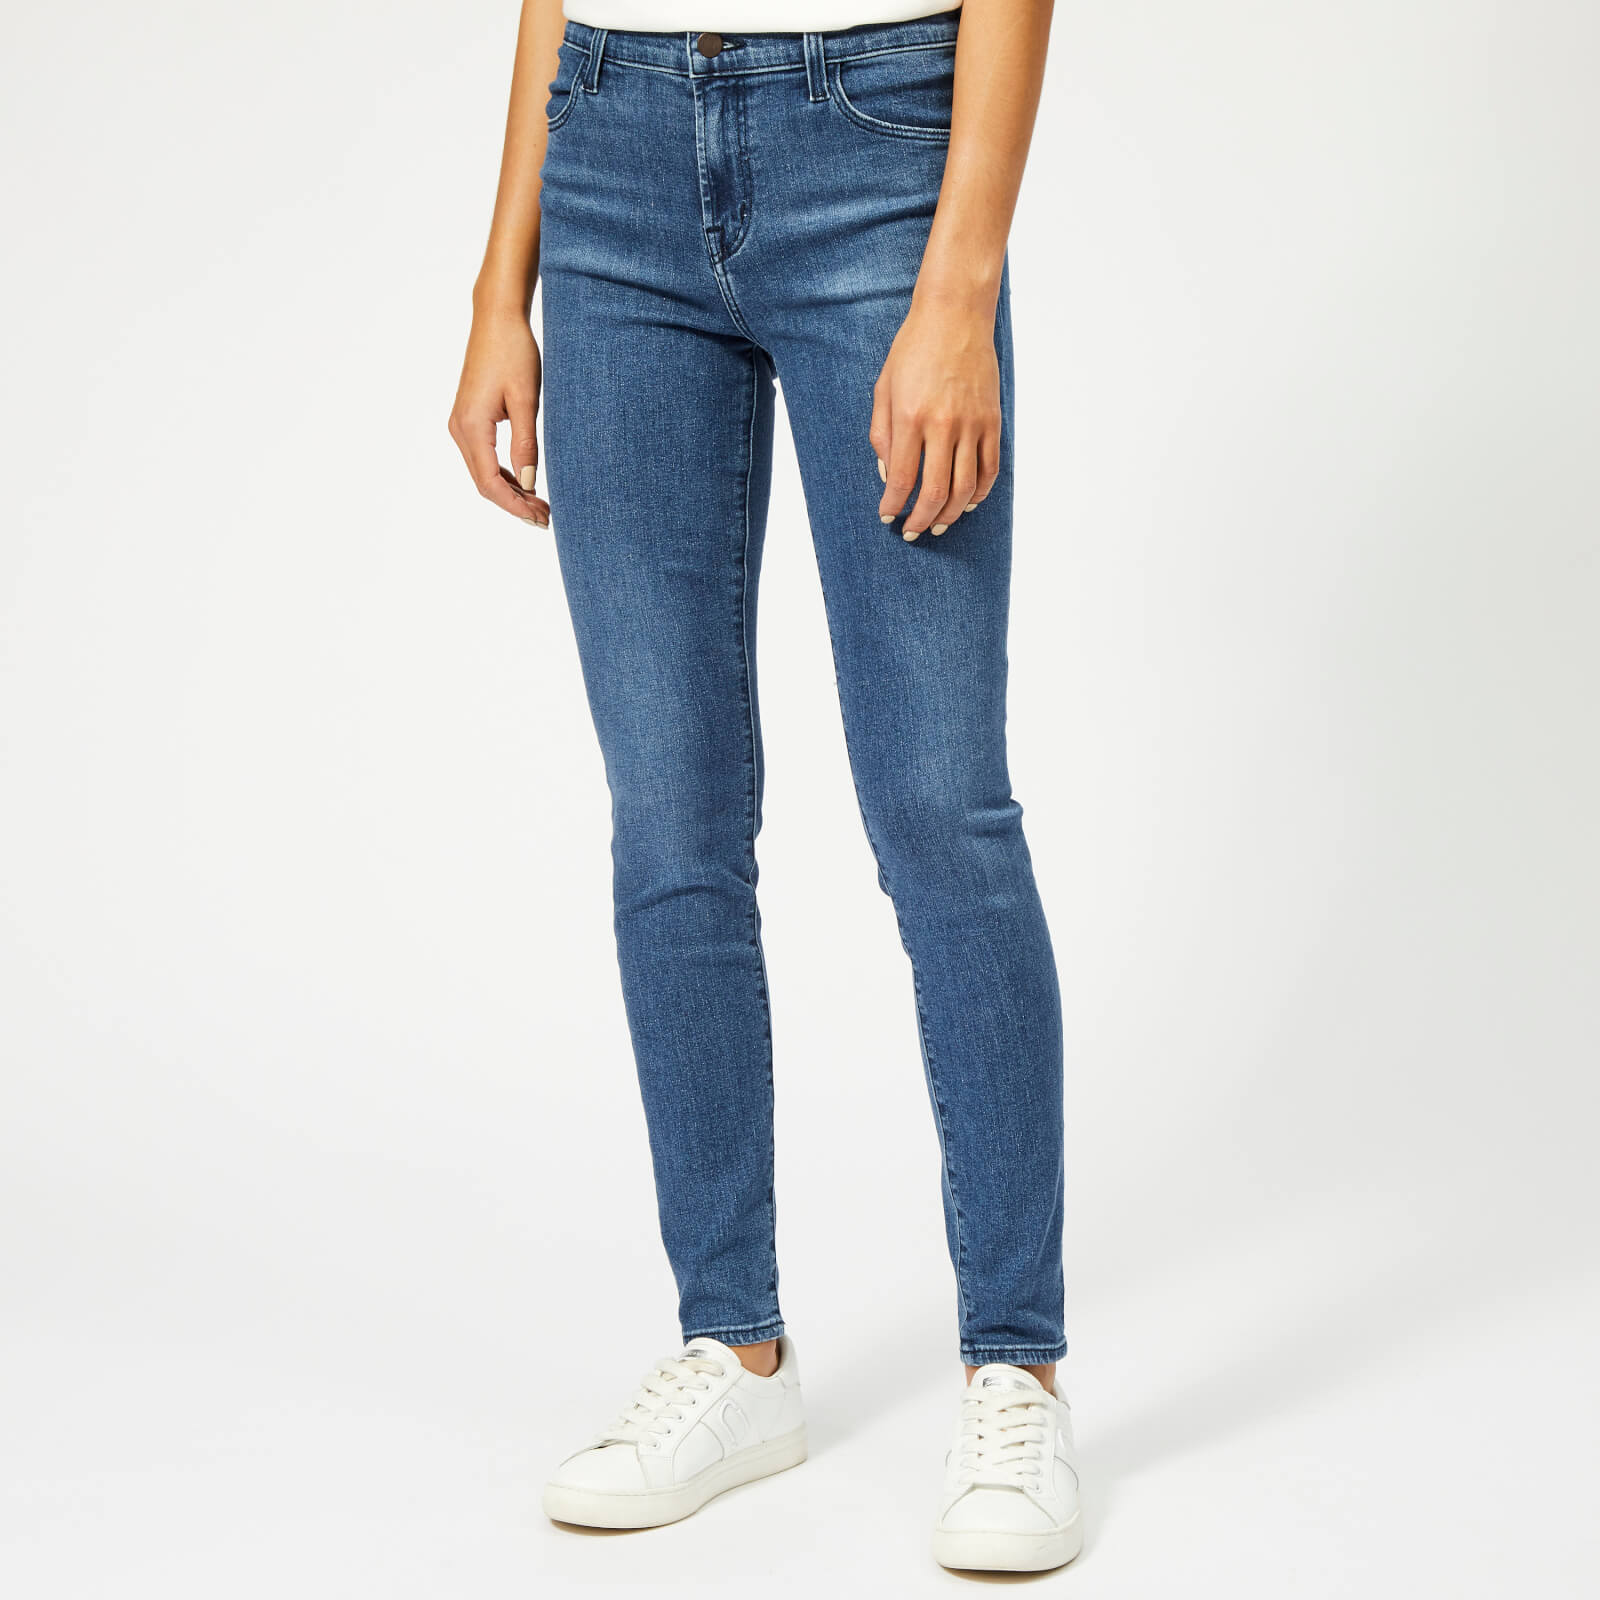 c2a6705dcbe90 J Brand Women s Maria High Rise Skinny Jeans - Earthy - Free UK ...